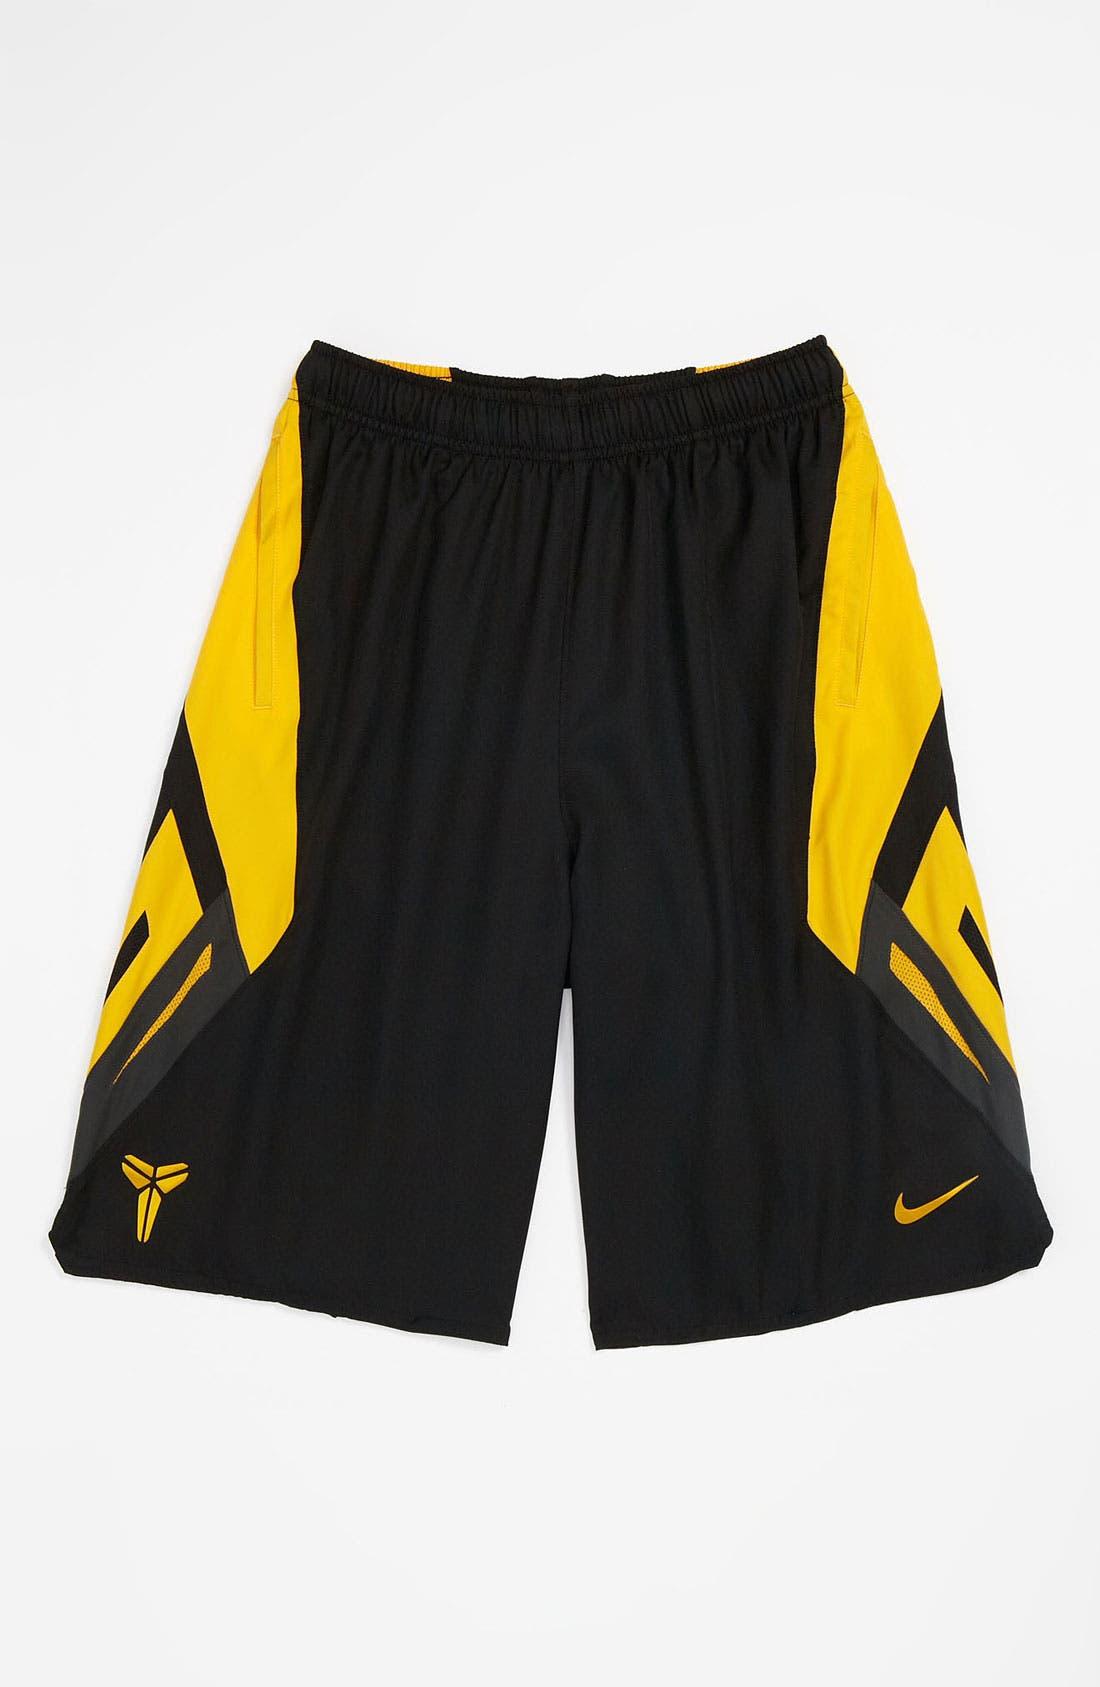 Alternate Image 1 Selected - Nike 'Kobe Game Time' Shorts (Big Boys)